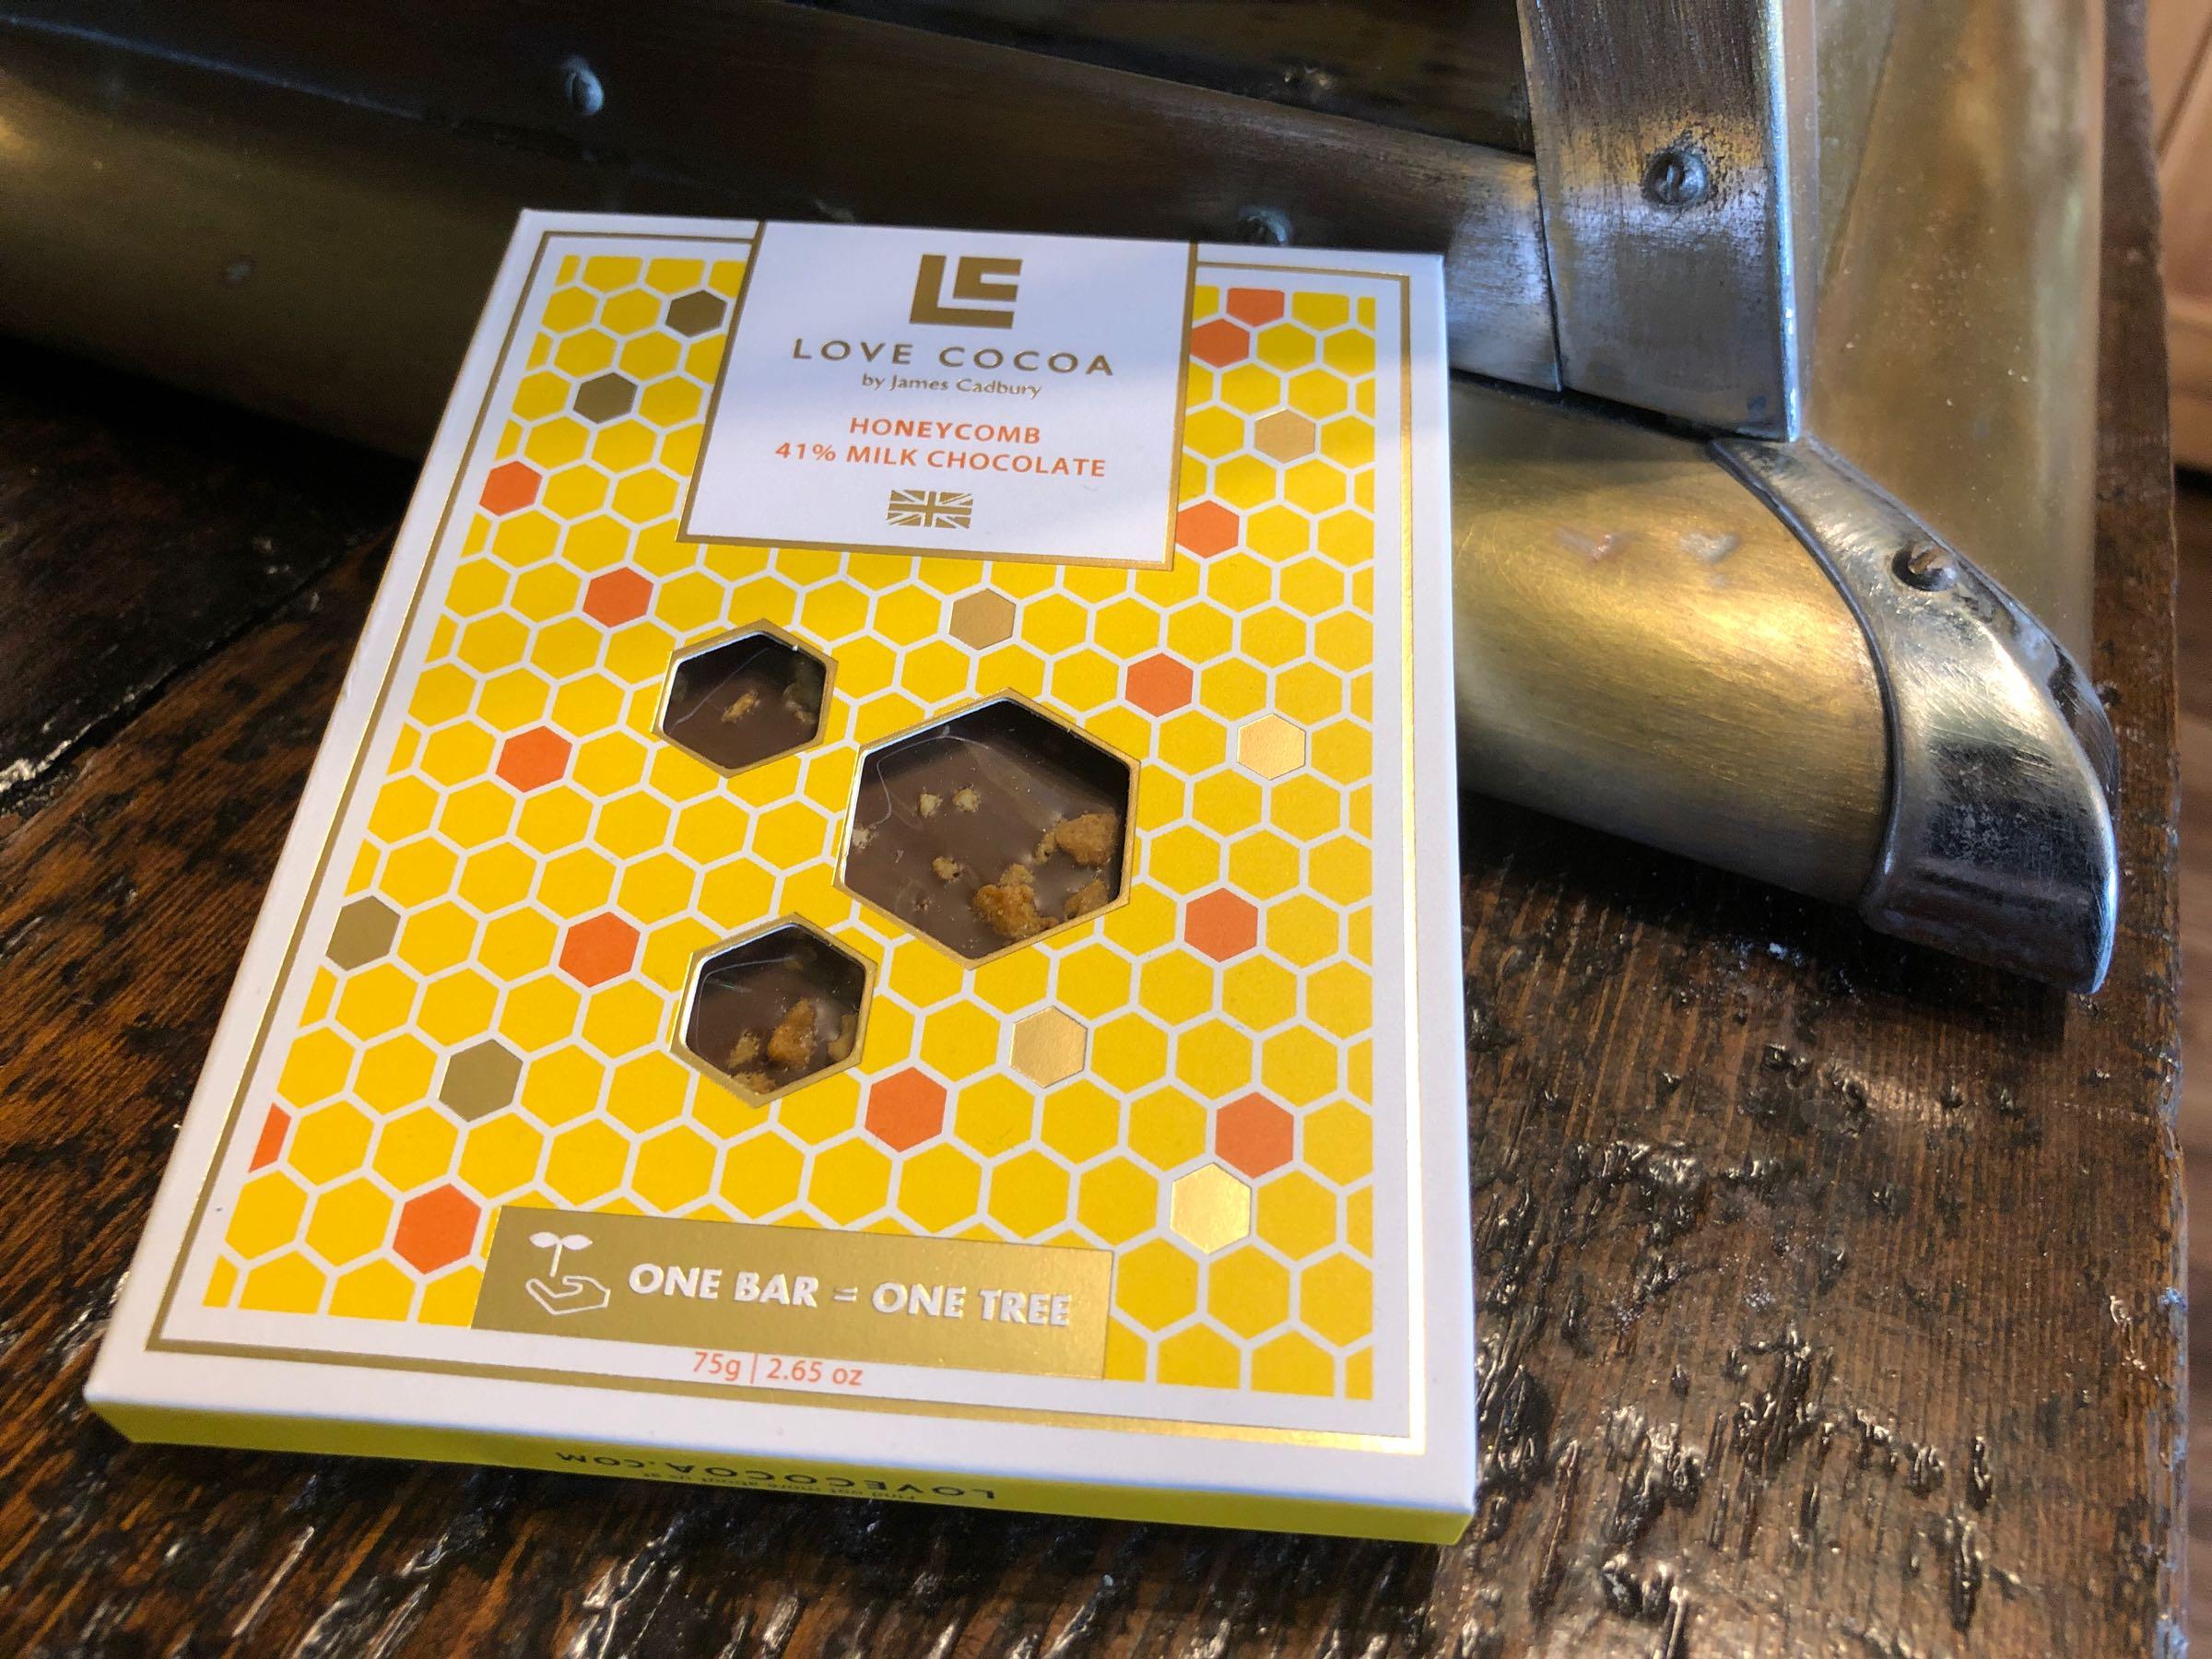 Love cocoa – Honeycomb & Honey Milk 80g